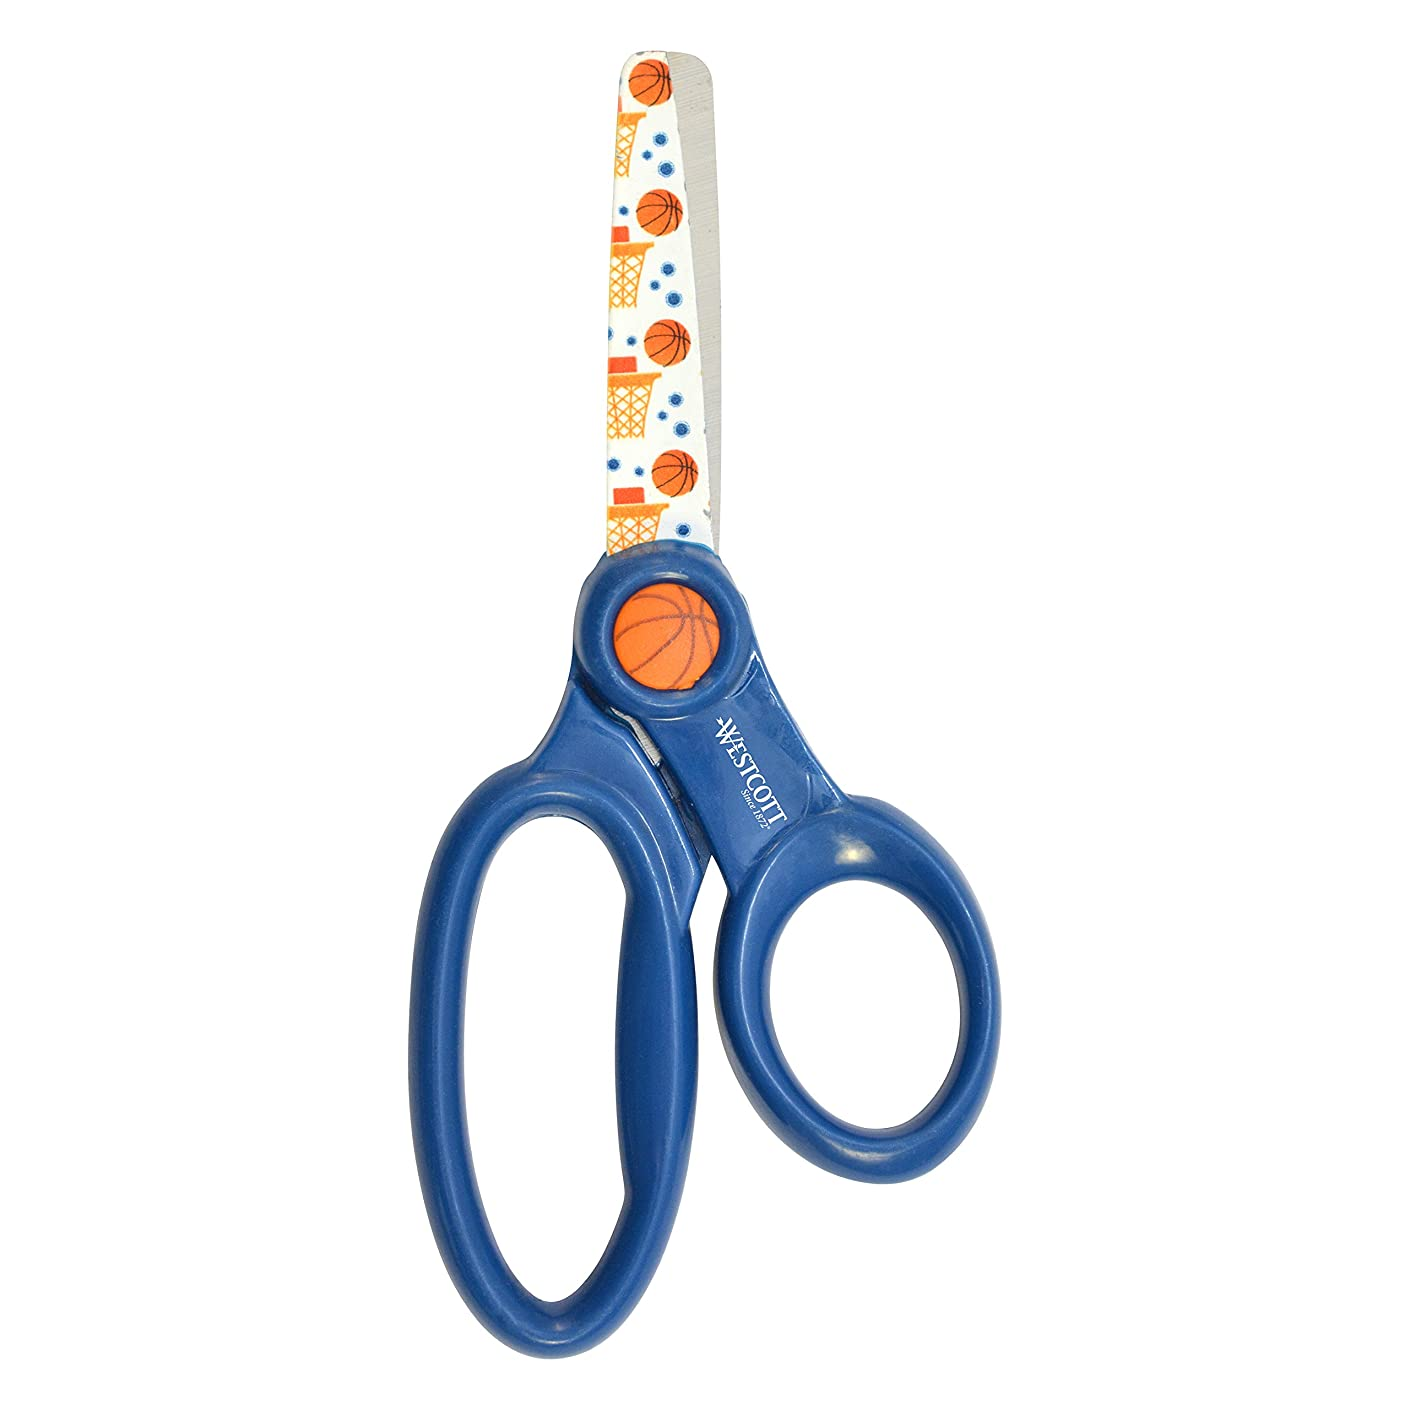 Westcott Kid's Basketball Sports Scissors, 5-Inch, Blunt (16859)